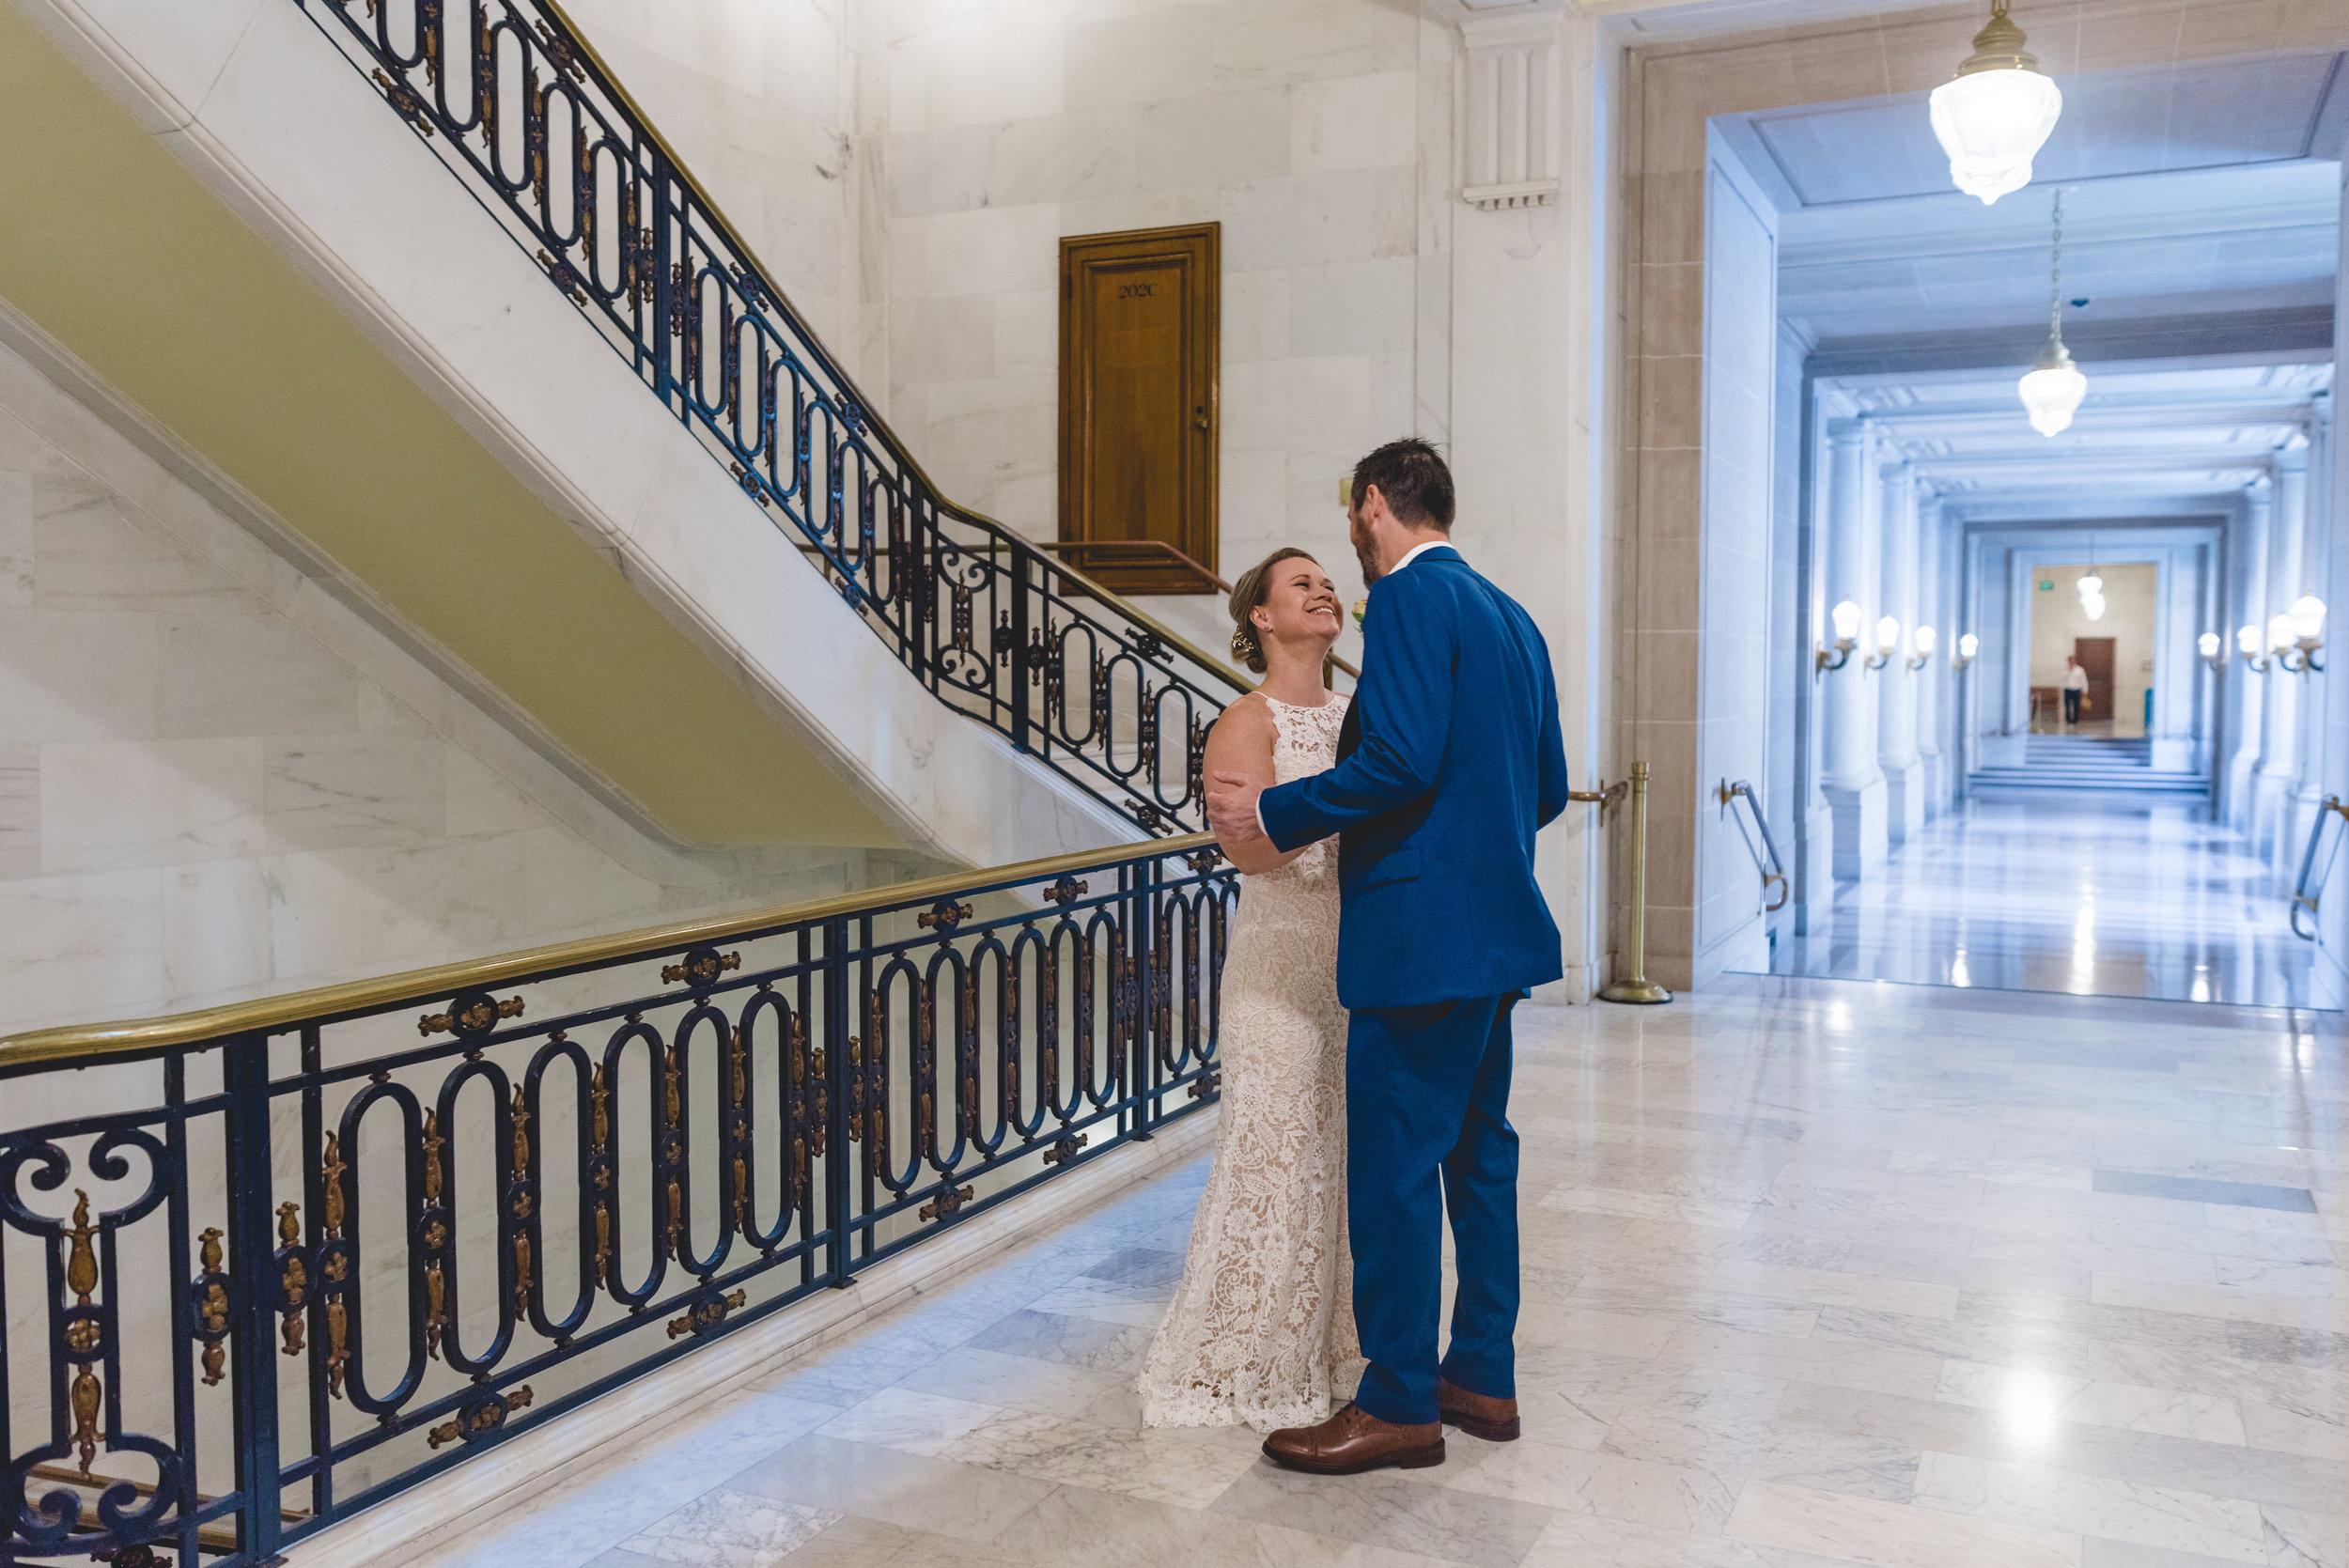 mcdaniels_conroy-wedding-couple-21.jpg